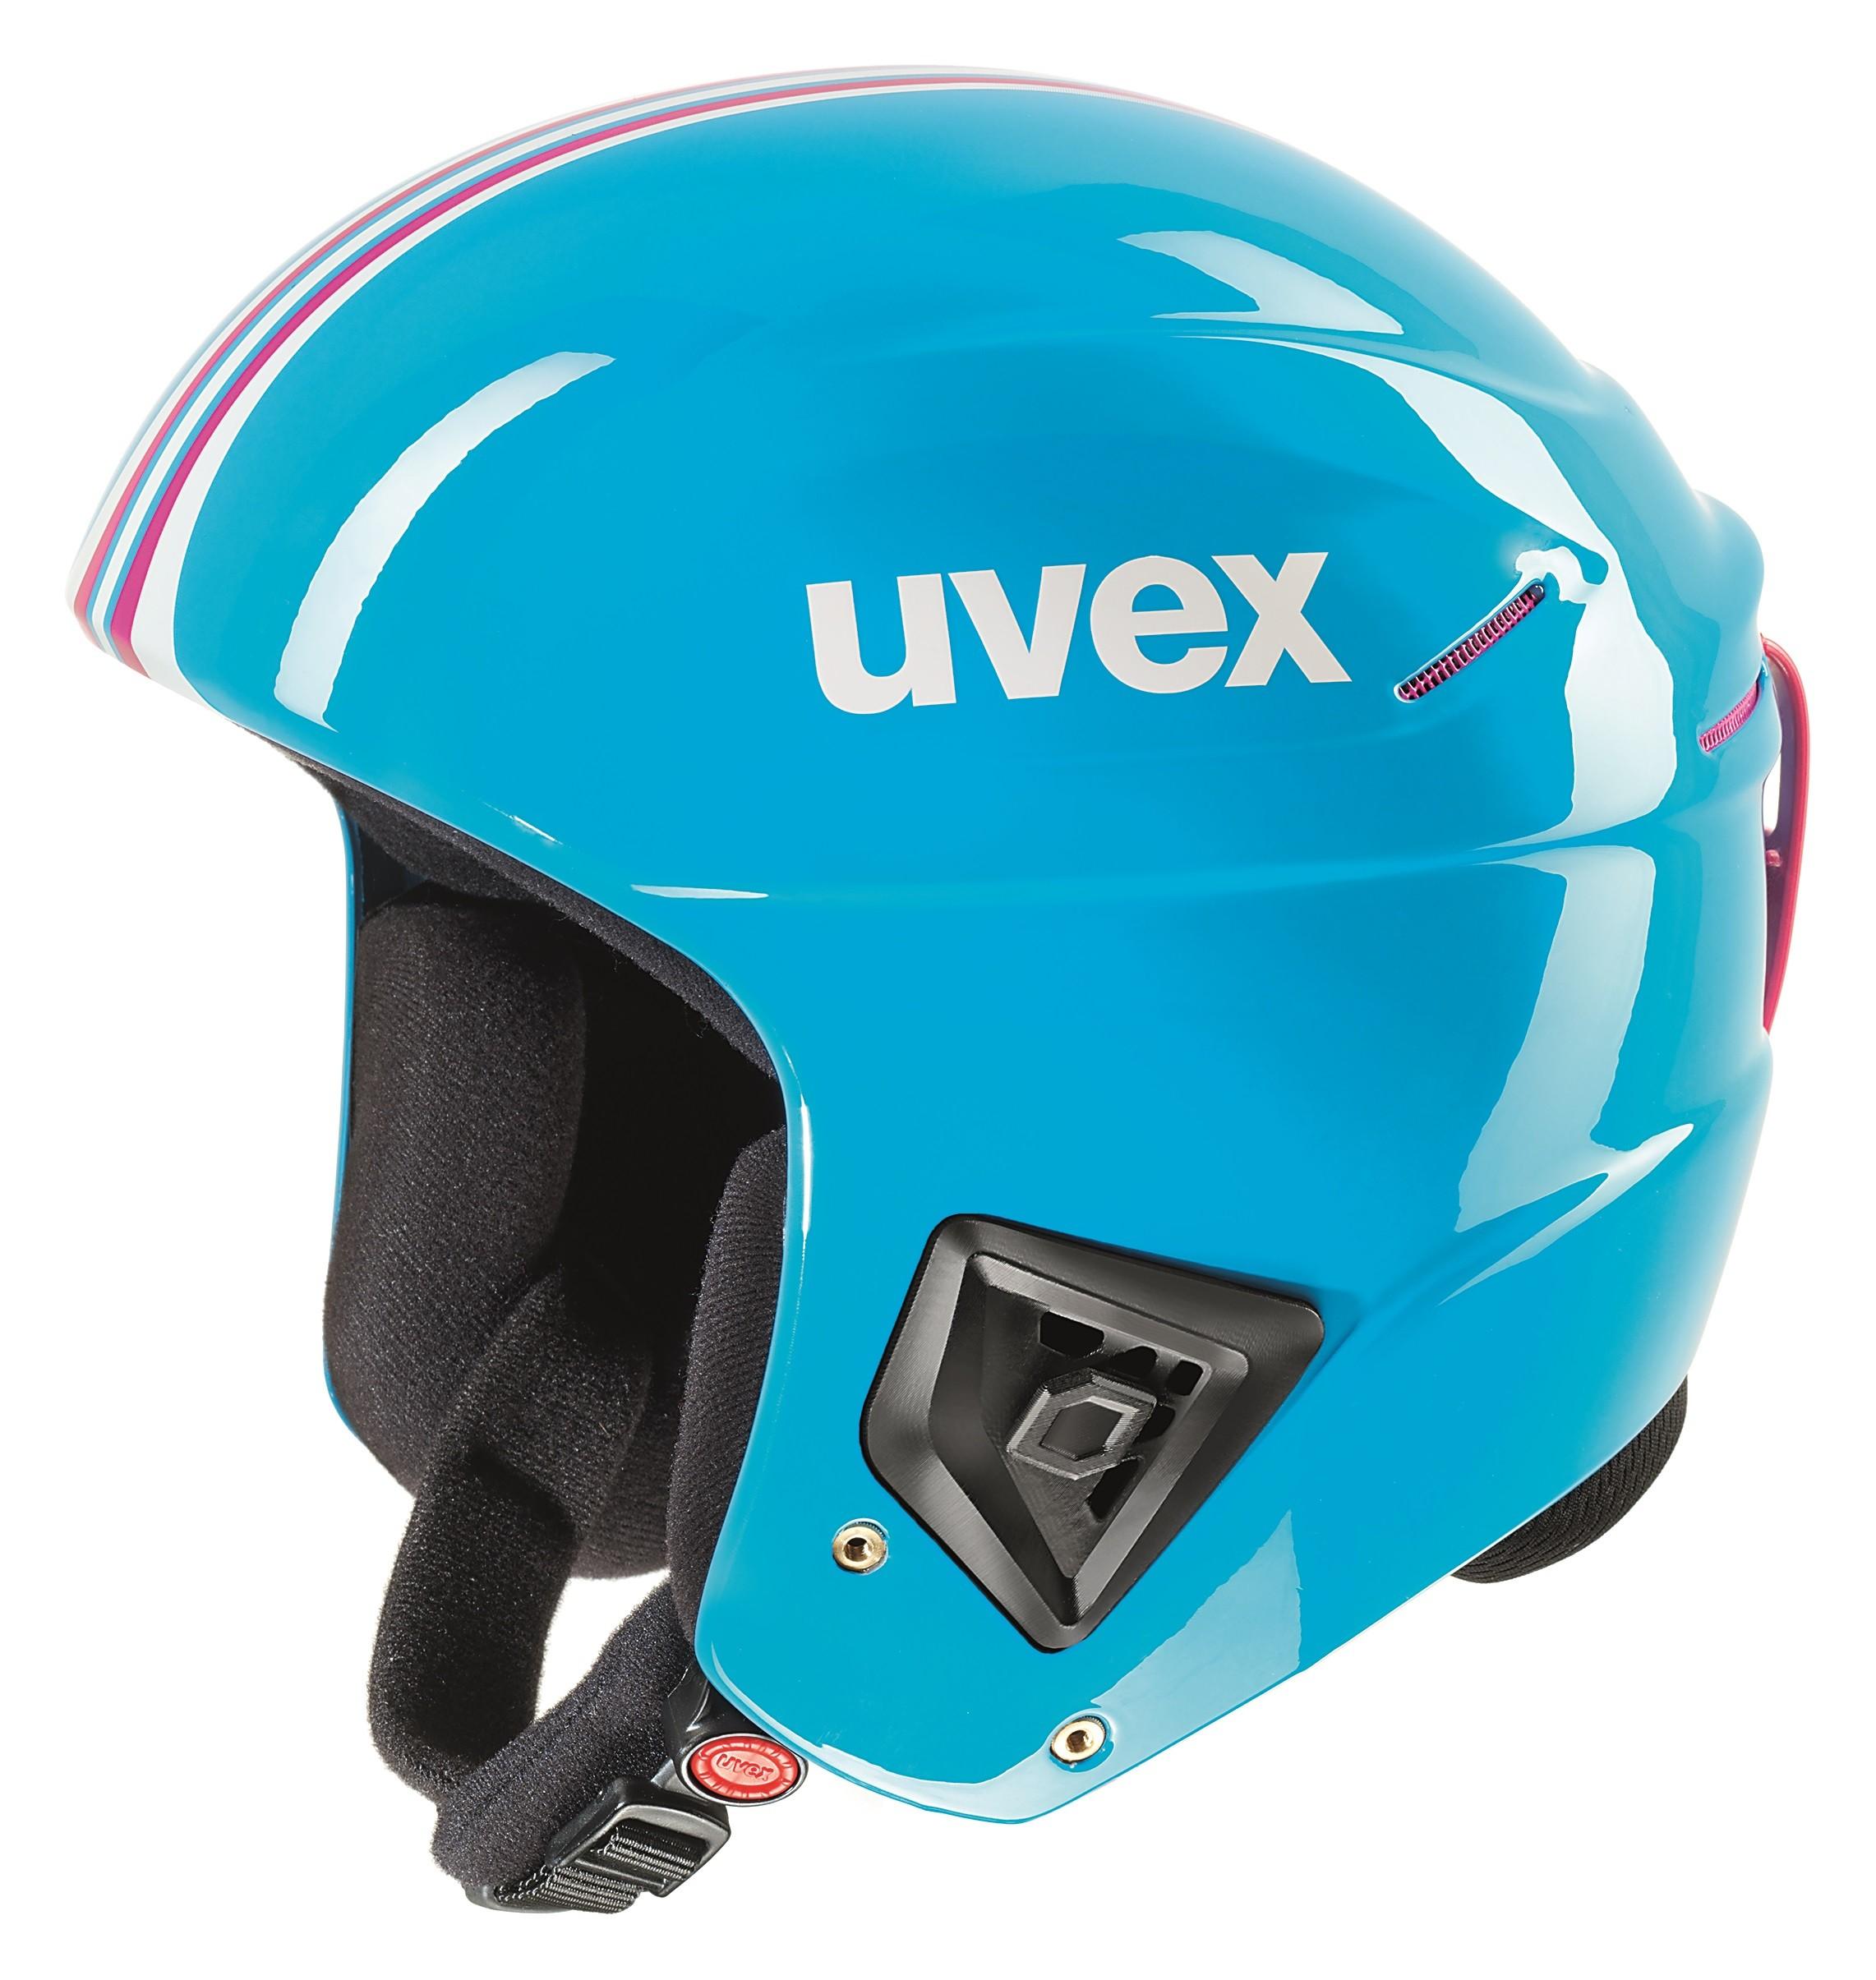 Smučarska čelada FIS Uvex race + modra, 2017